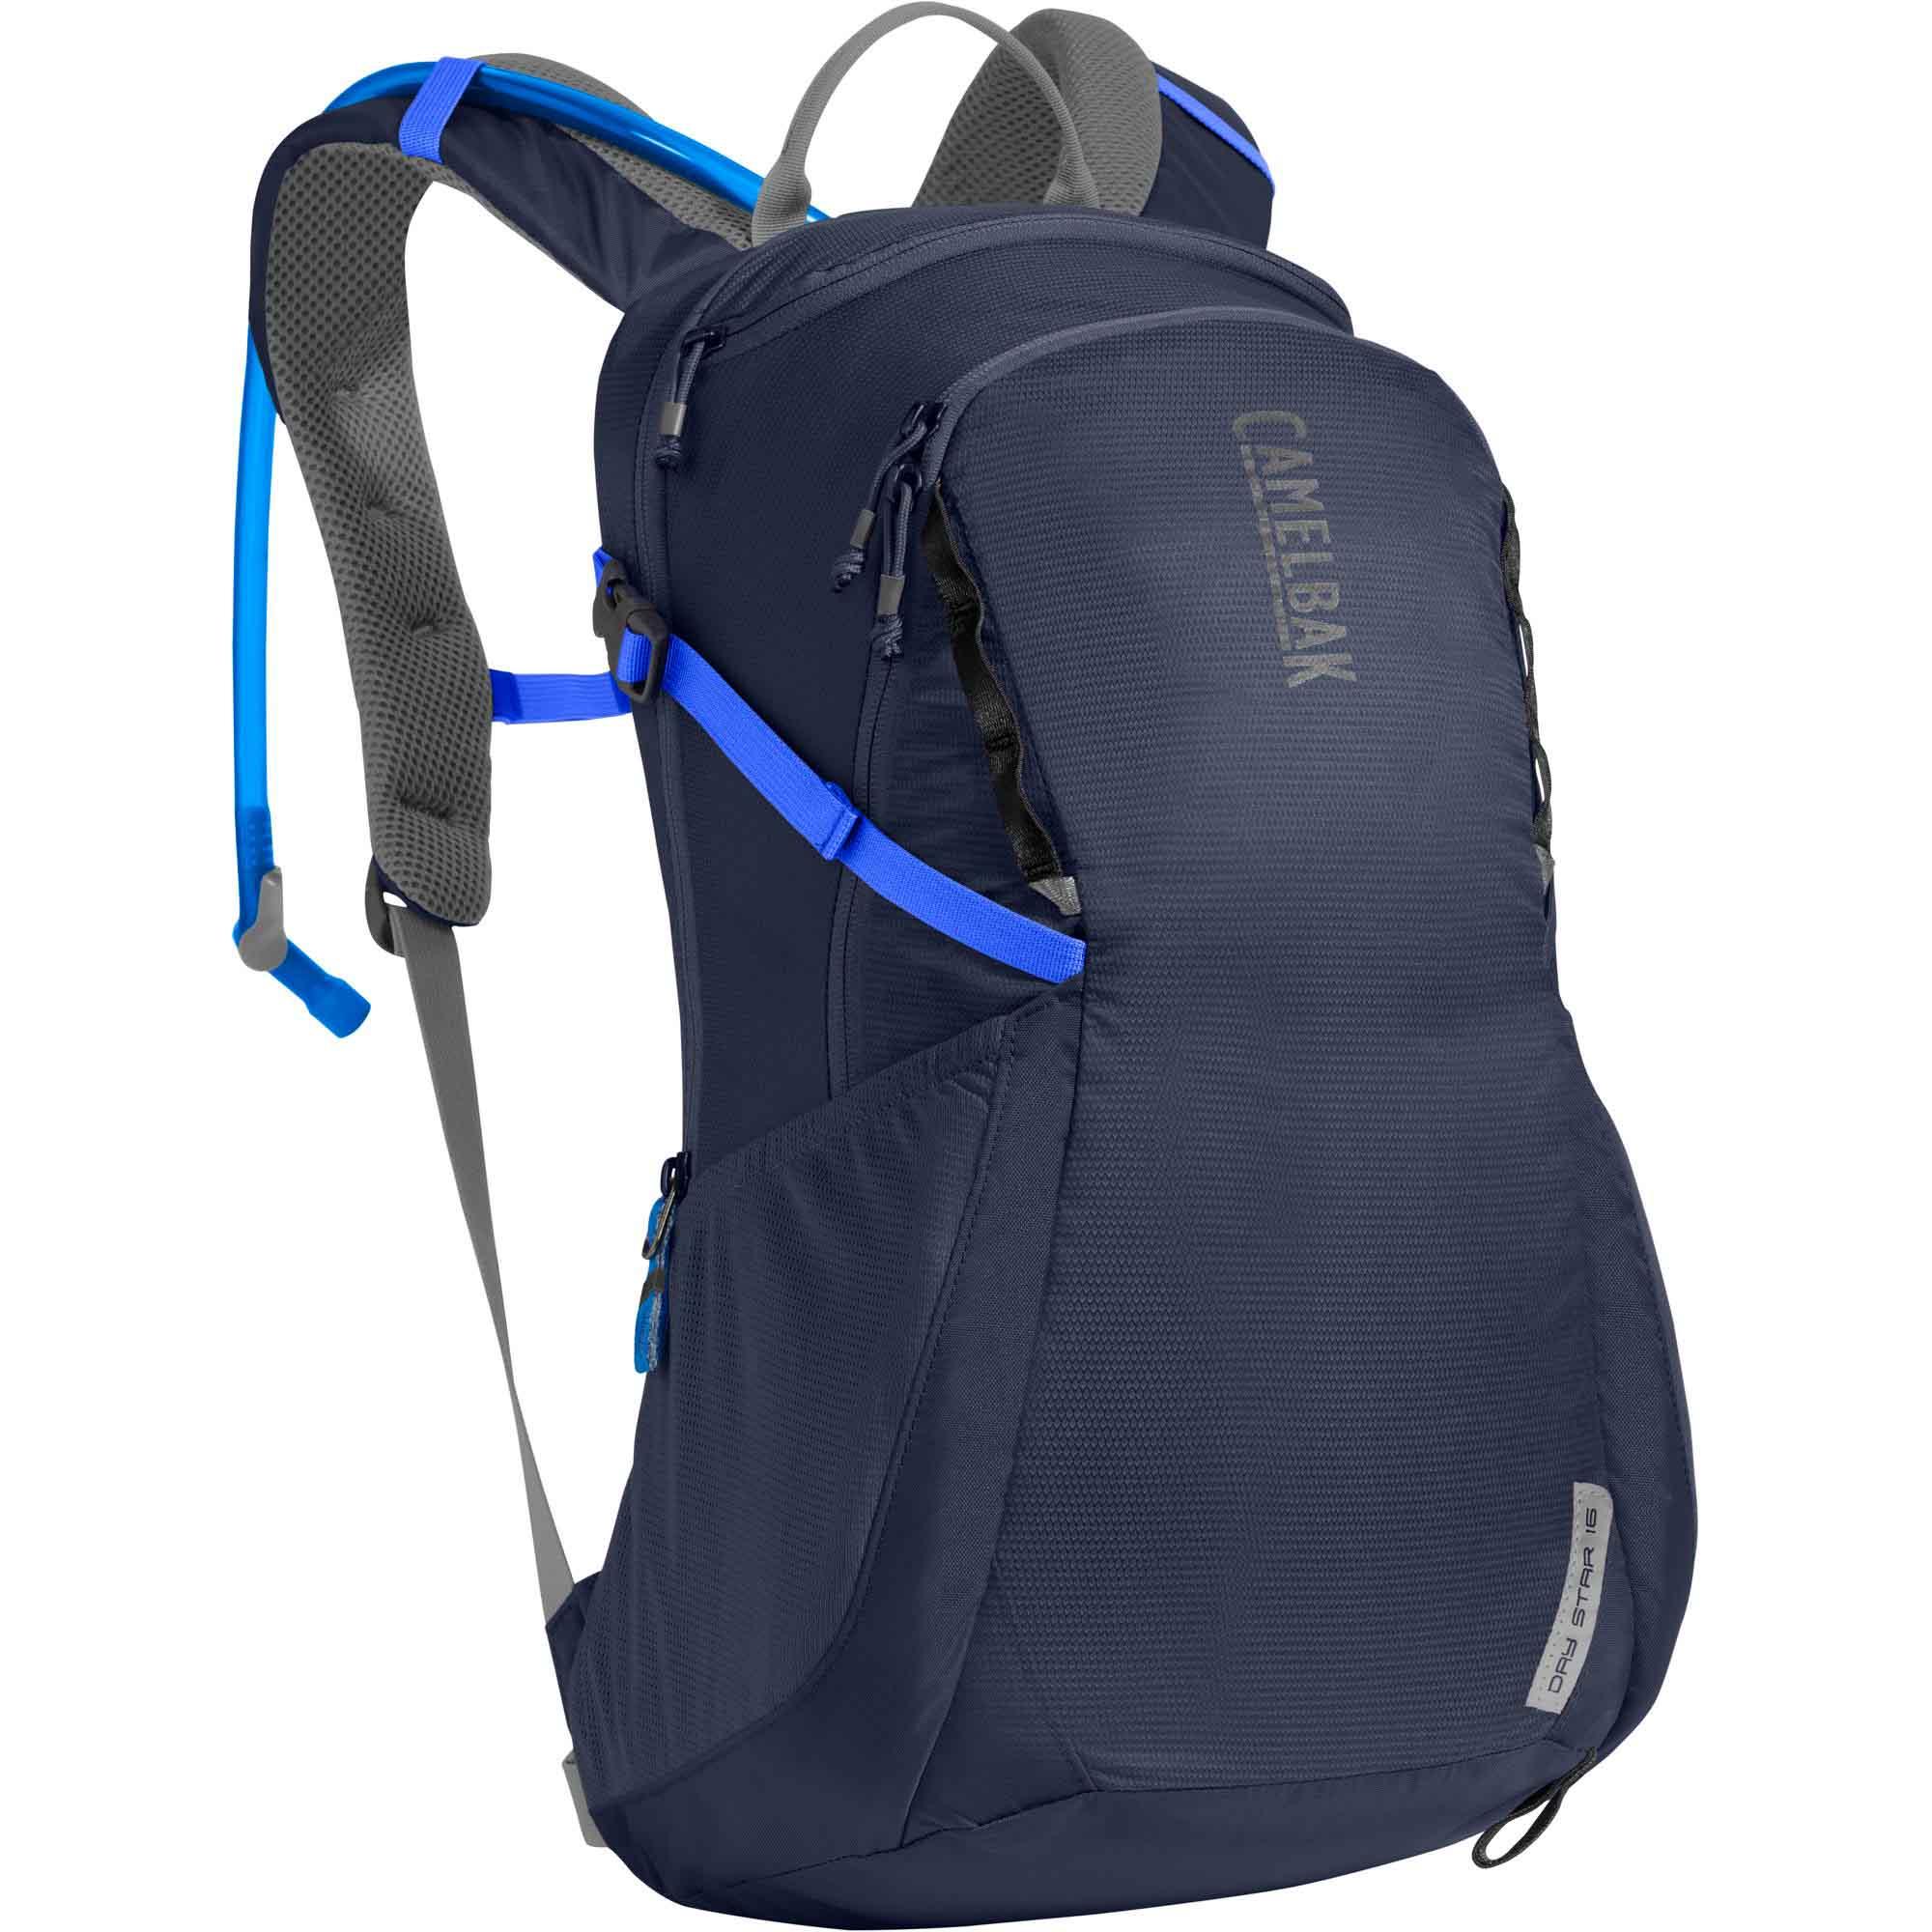 Camelbak Daystar 16 Hydration Hiking Backpack